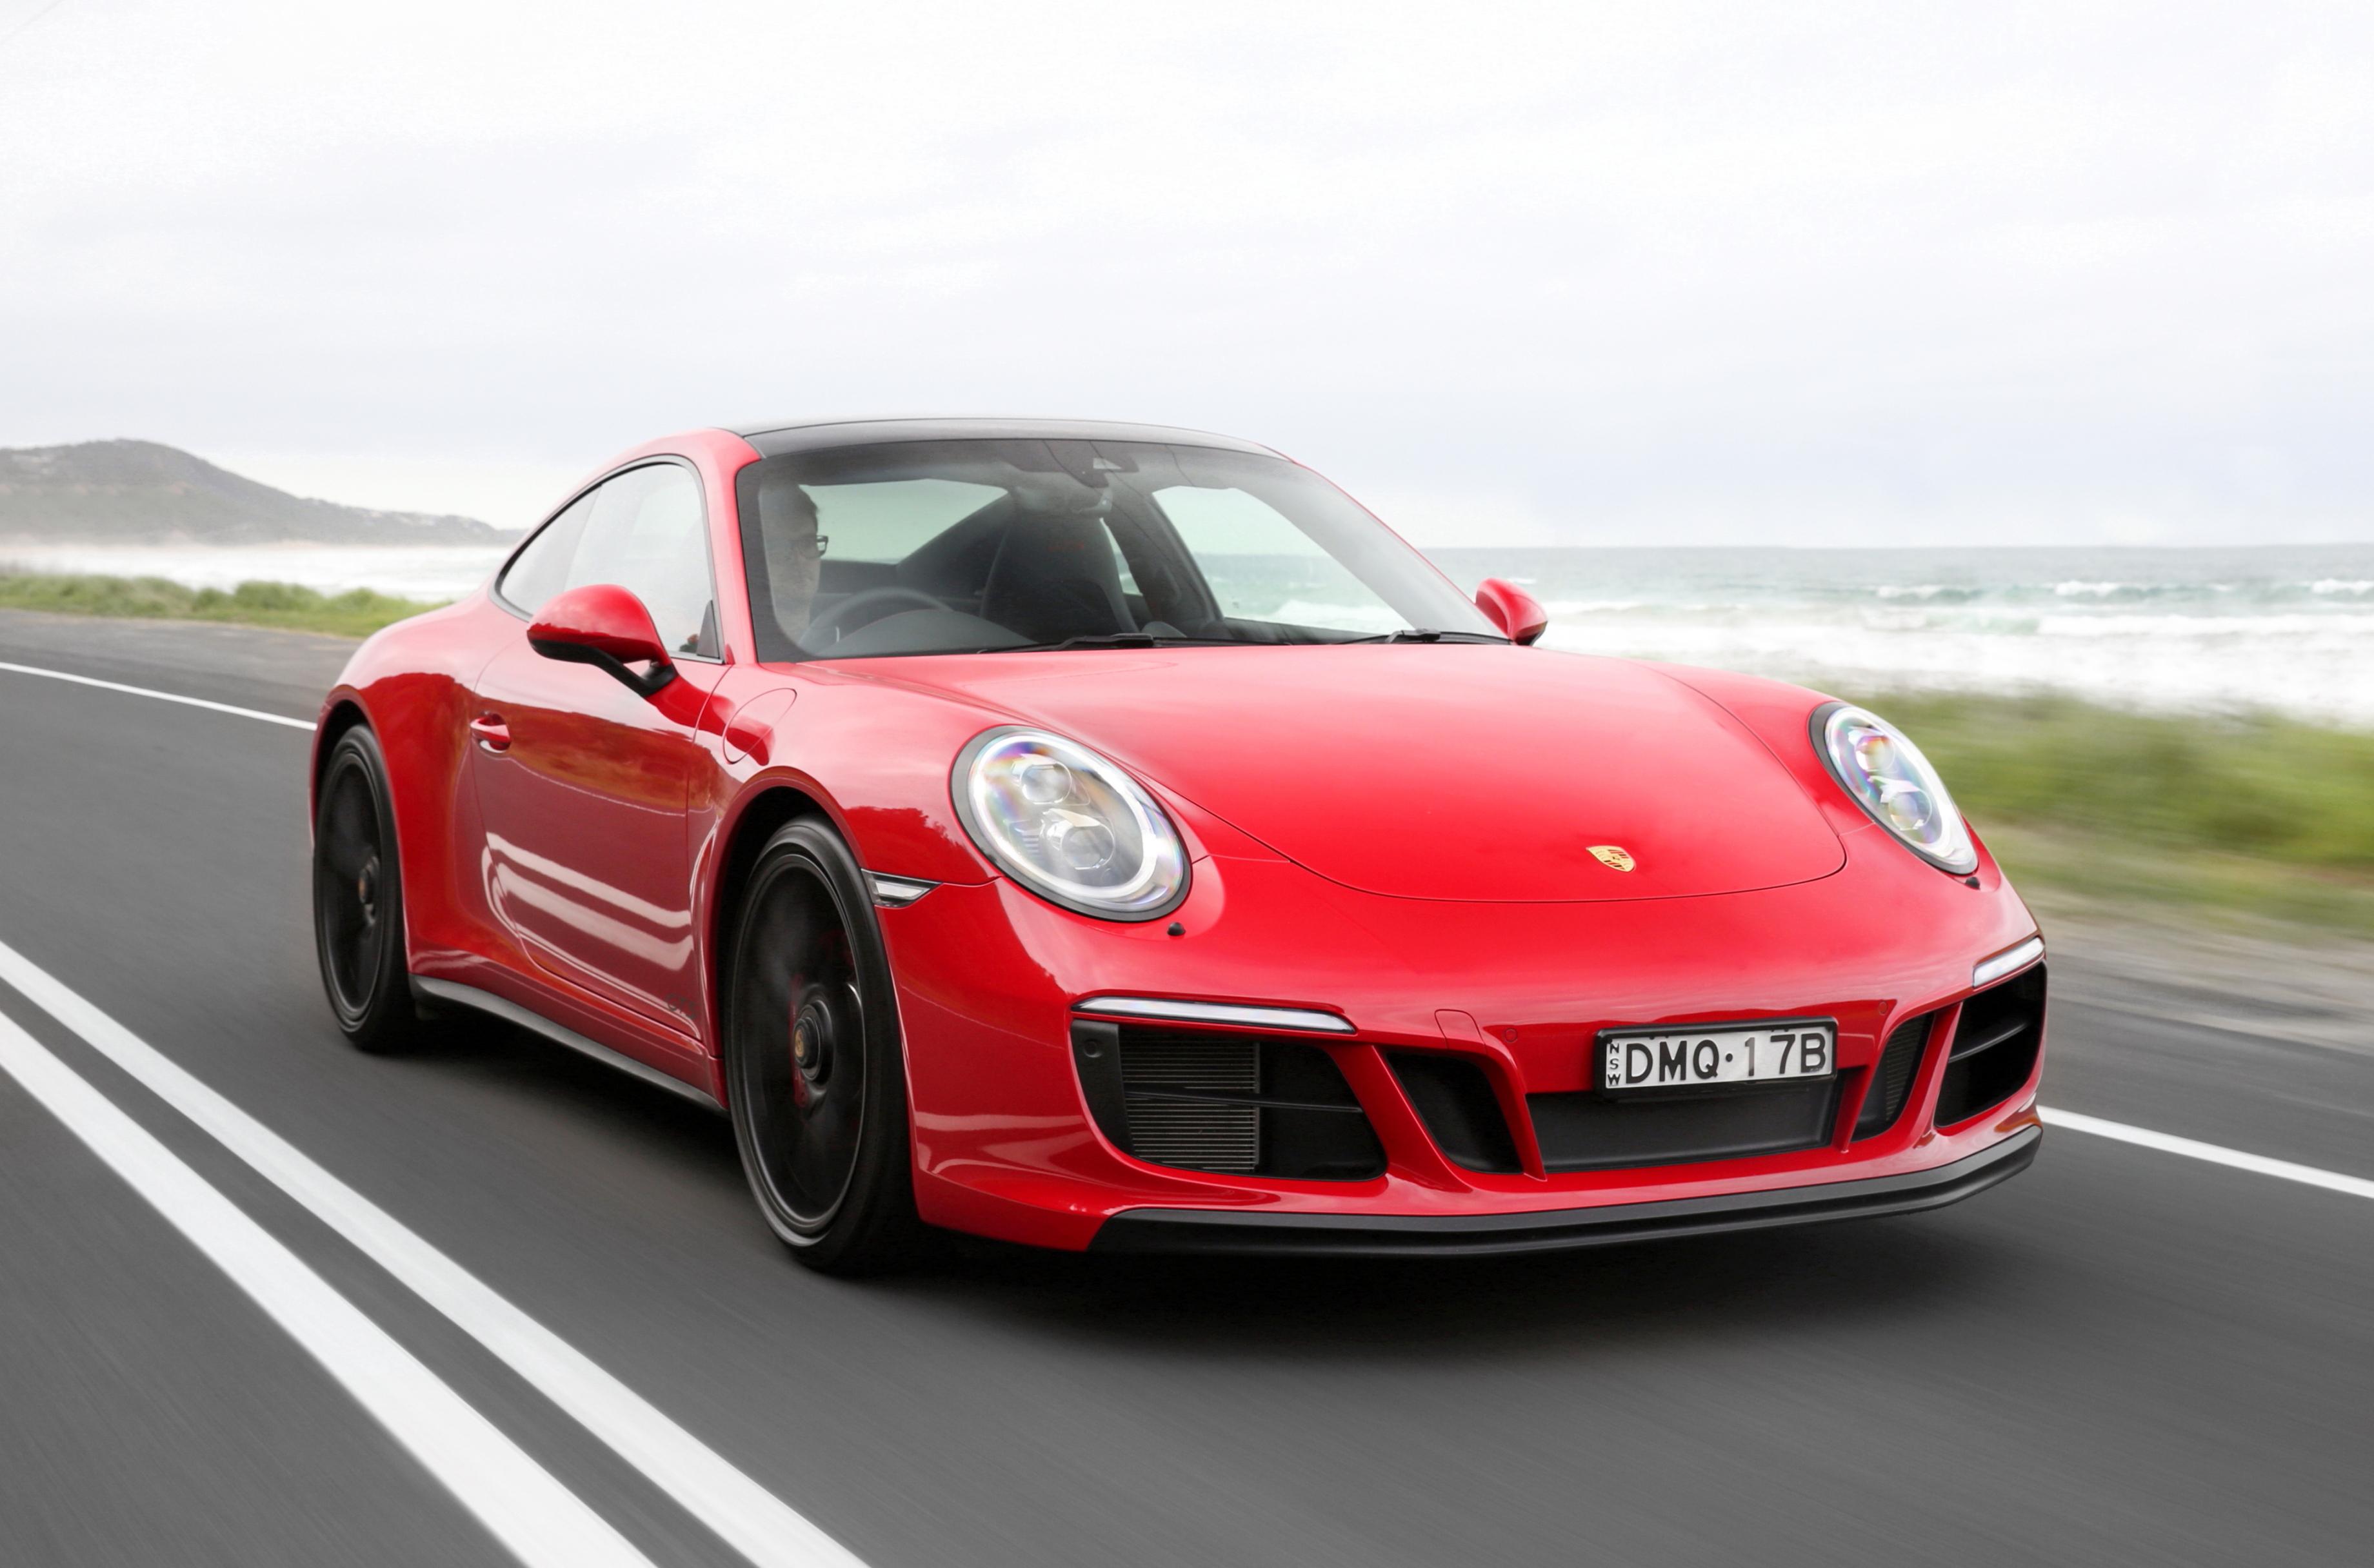 2017 Porsche 911 Carrera4 GTS review